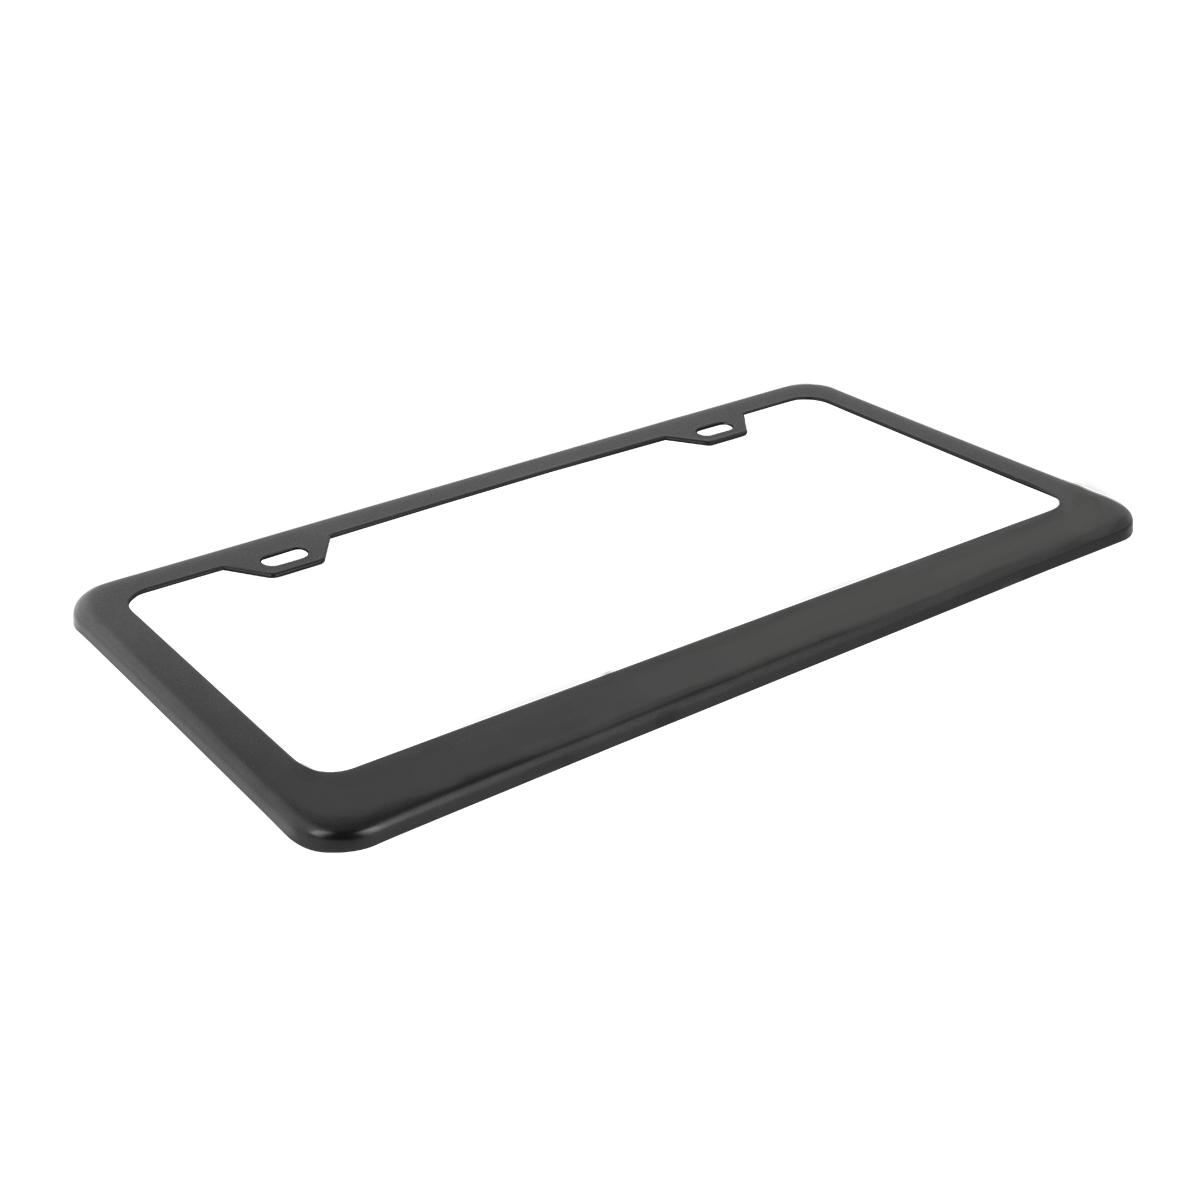 60439 Flat/Matte Plain Black 2 Hole License Plate Frame - Top View